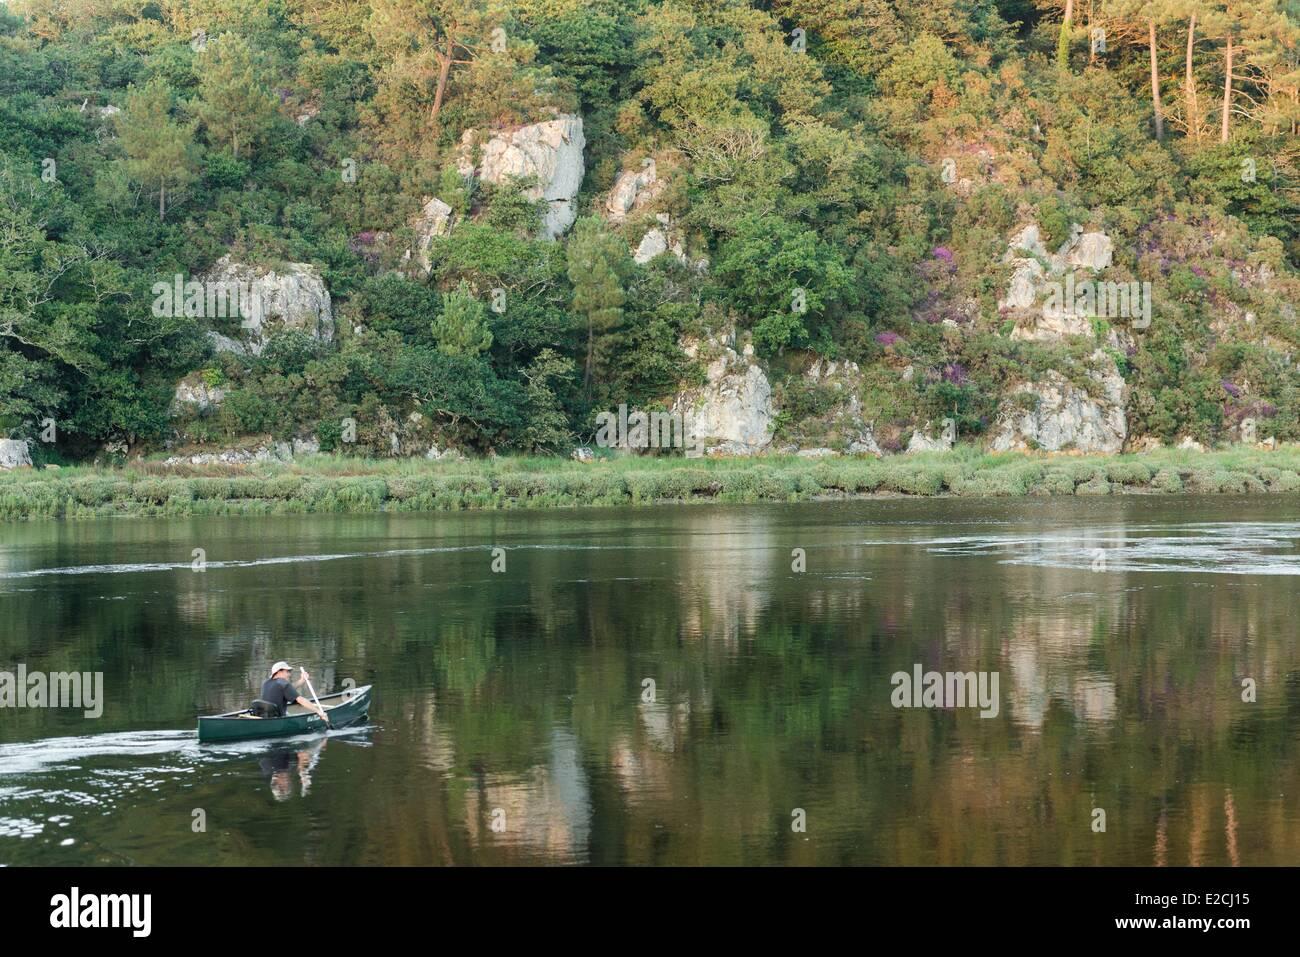 France, Finistere, Clohars Carnoet, canoe on the estuary of the Laita river - Stock Image